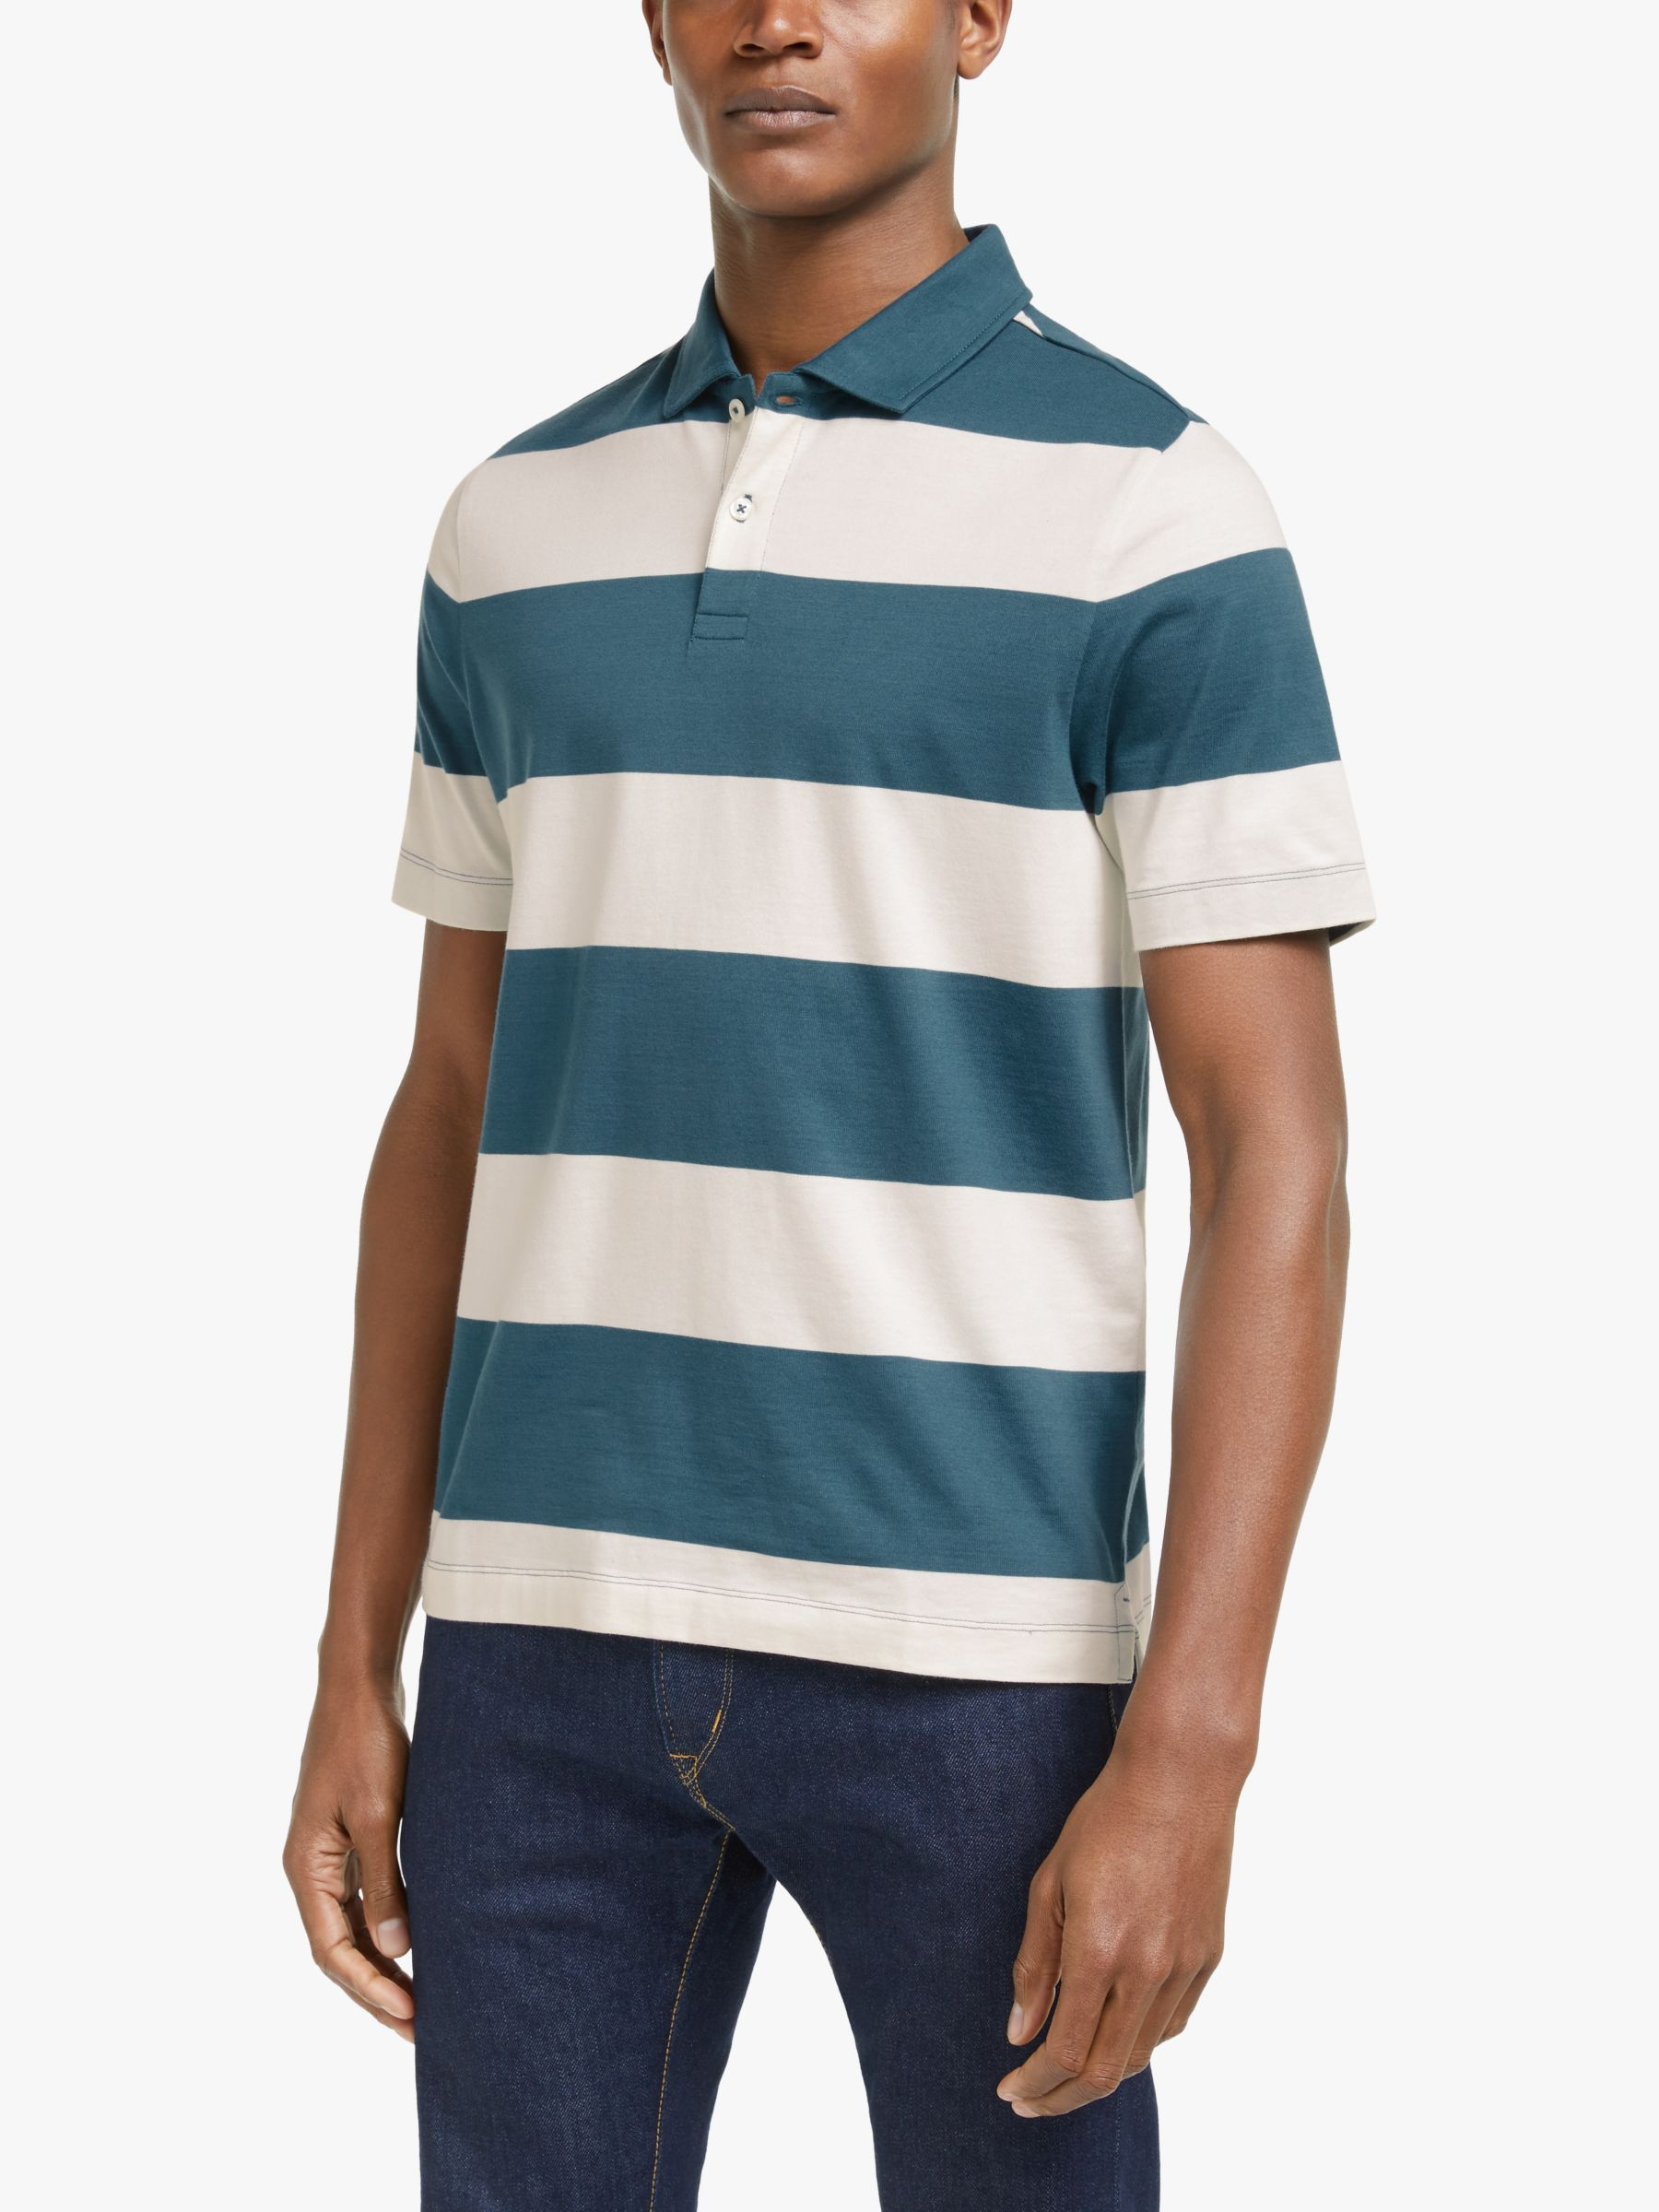 John Lewis & Partners Single Jersey Supima Cotton Stripe Polo Shirt